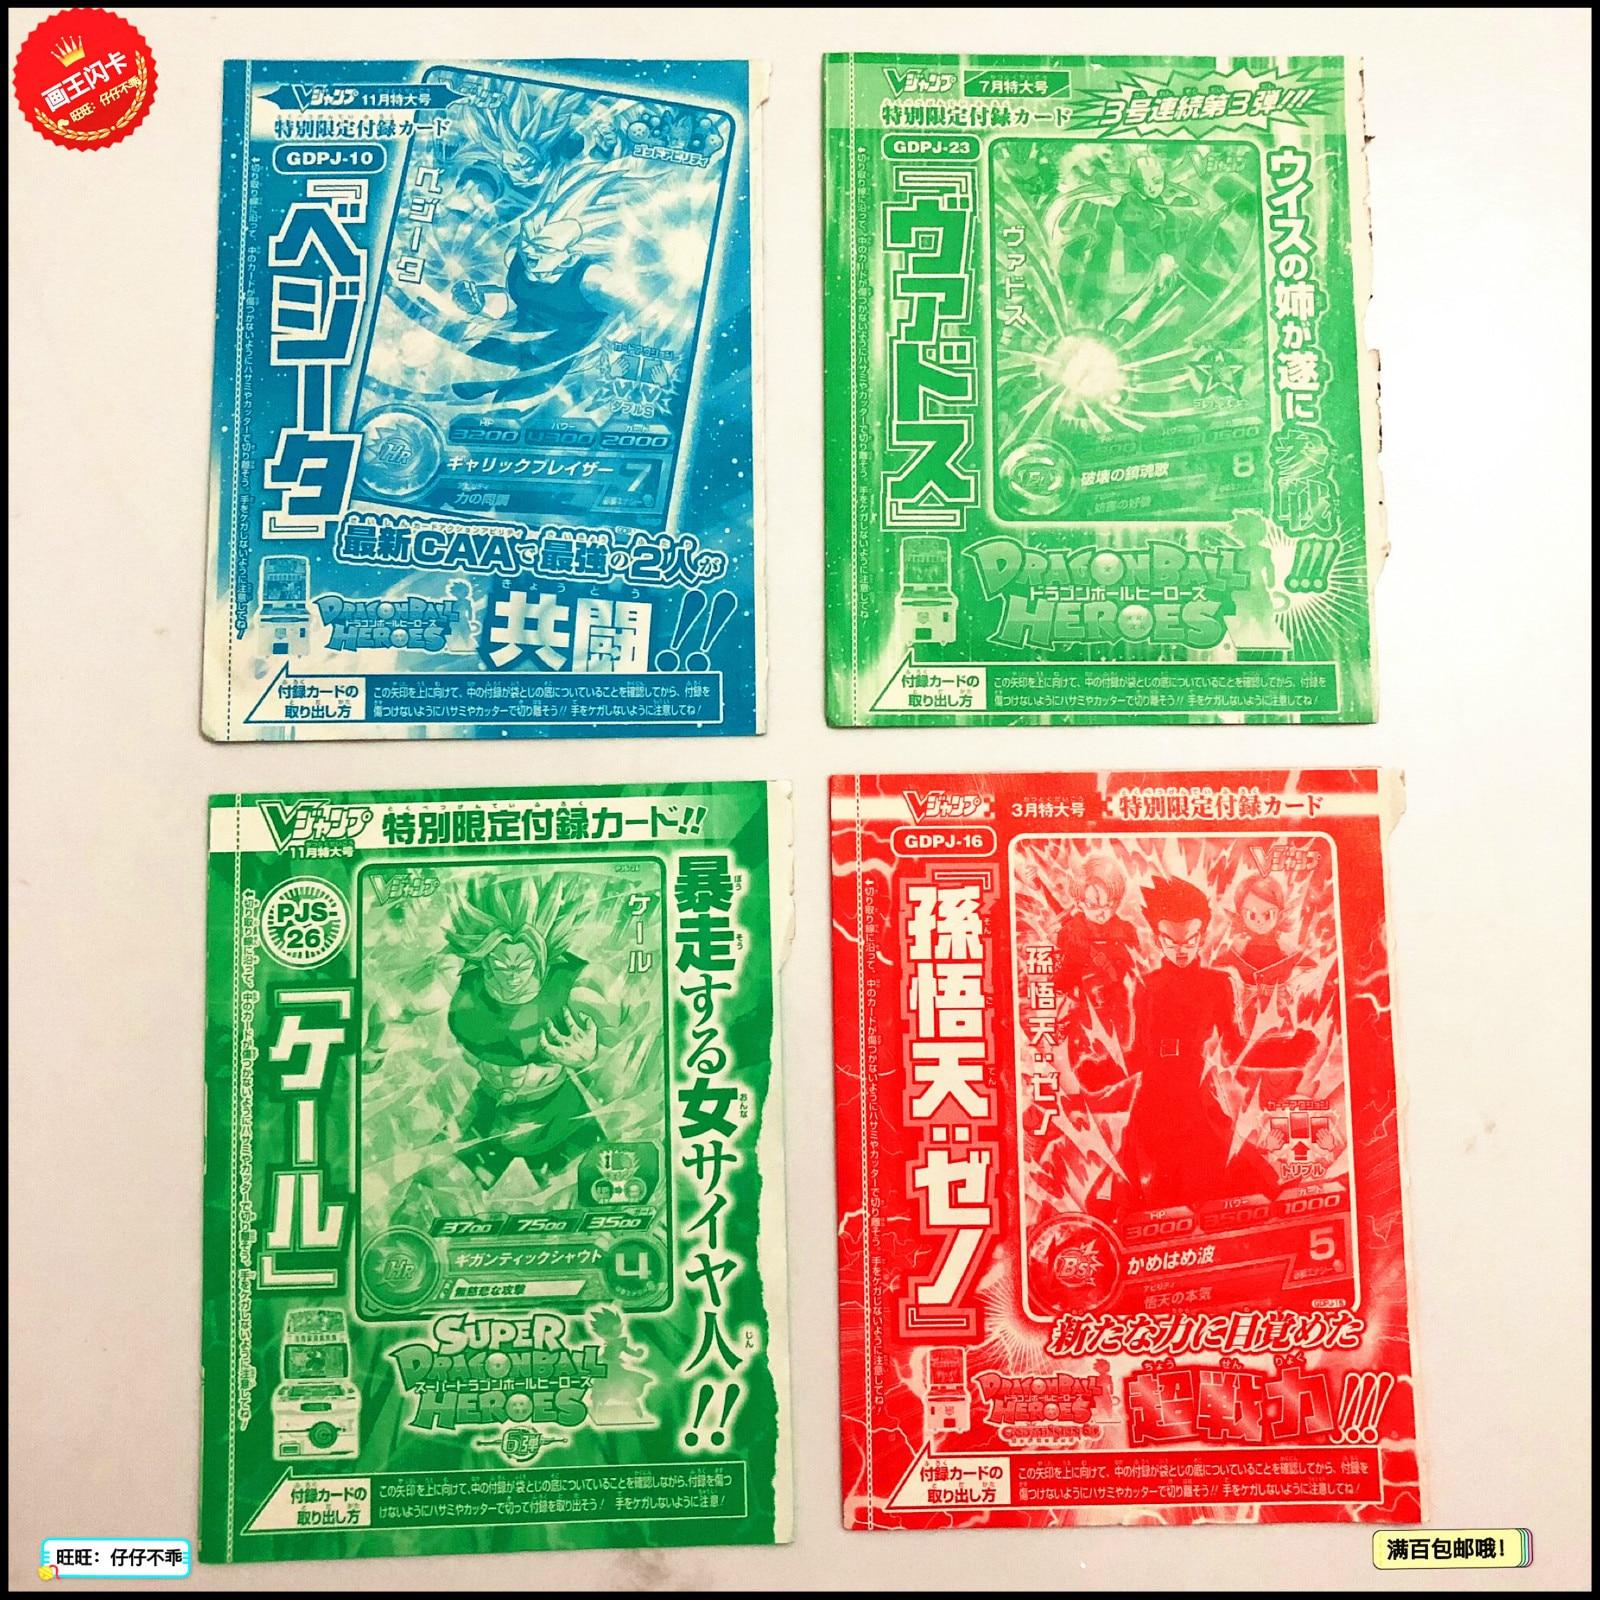 Japan Original Dragon Ball Hero Card GDPJ PJS Goku Toys Hobbies Collectibles Game Collection Anime Cards